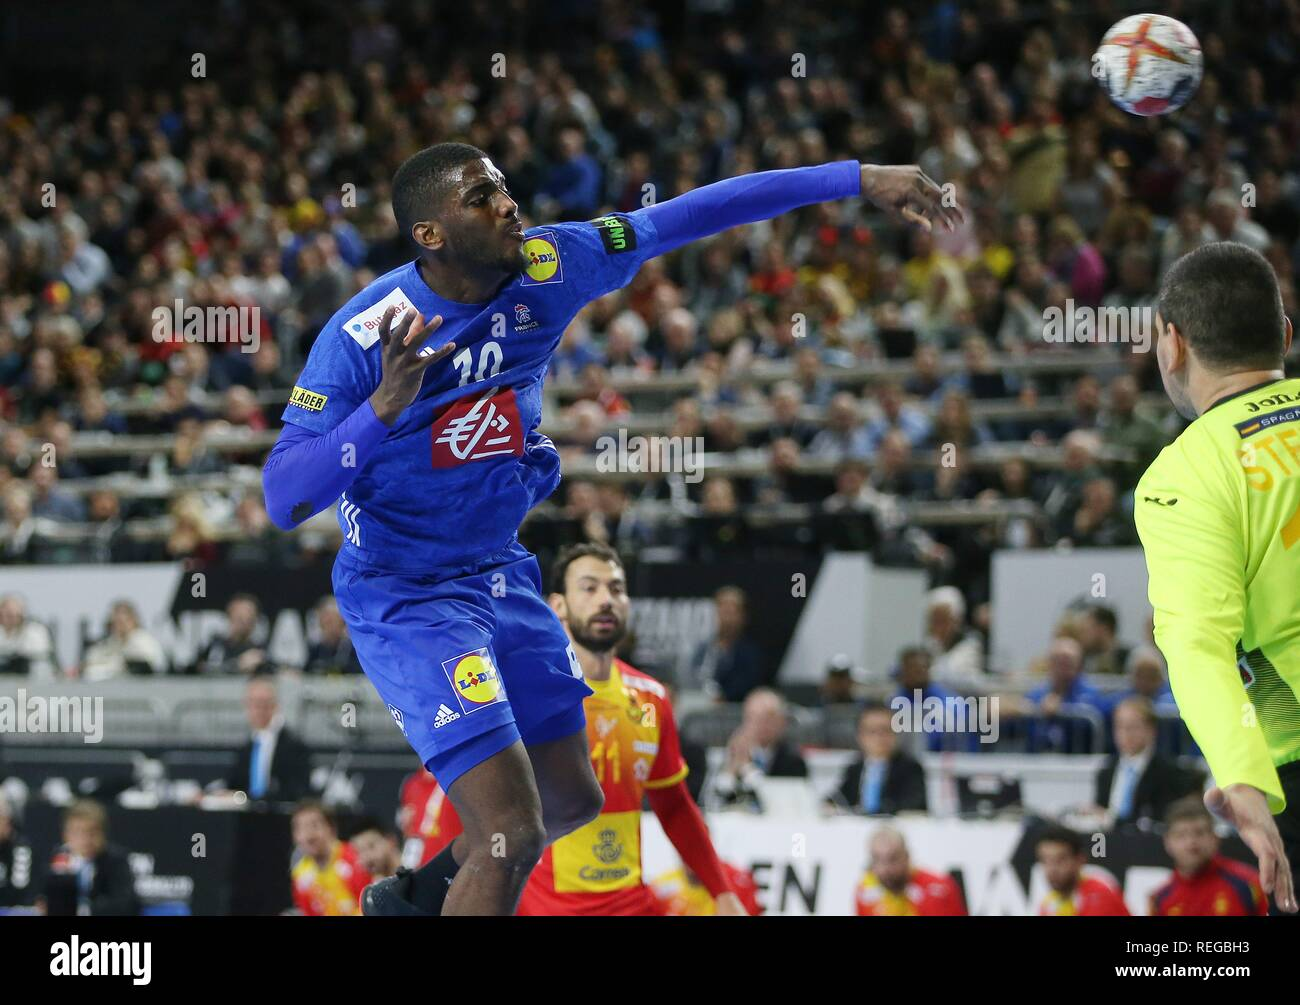 firo: 19.01.2019, Handball: World Cup World Cup Main Round France - Spain Single Action, Dika Mem, FRA   usage worldwide - Stock Image